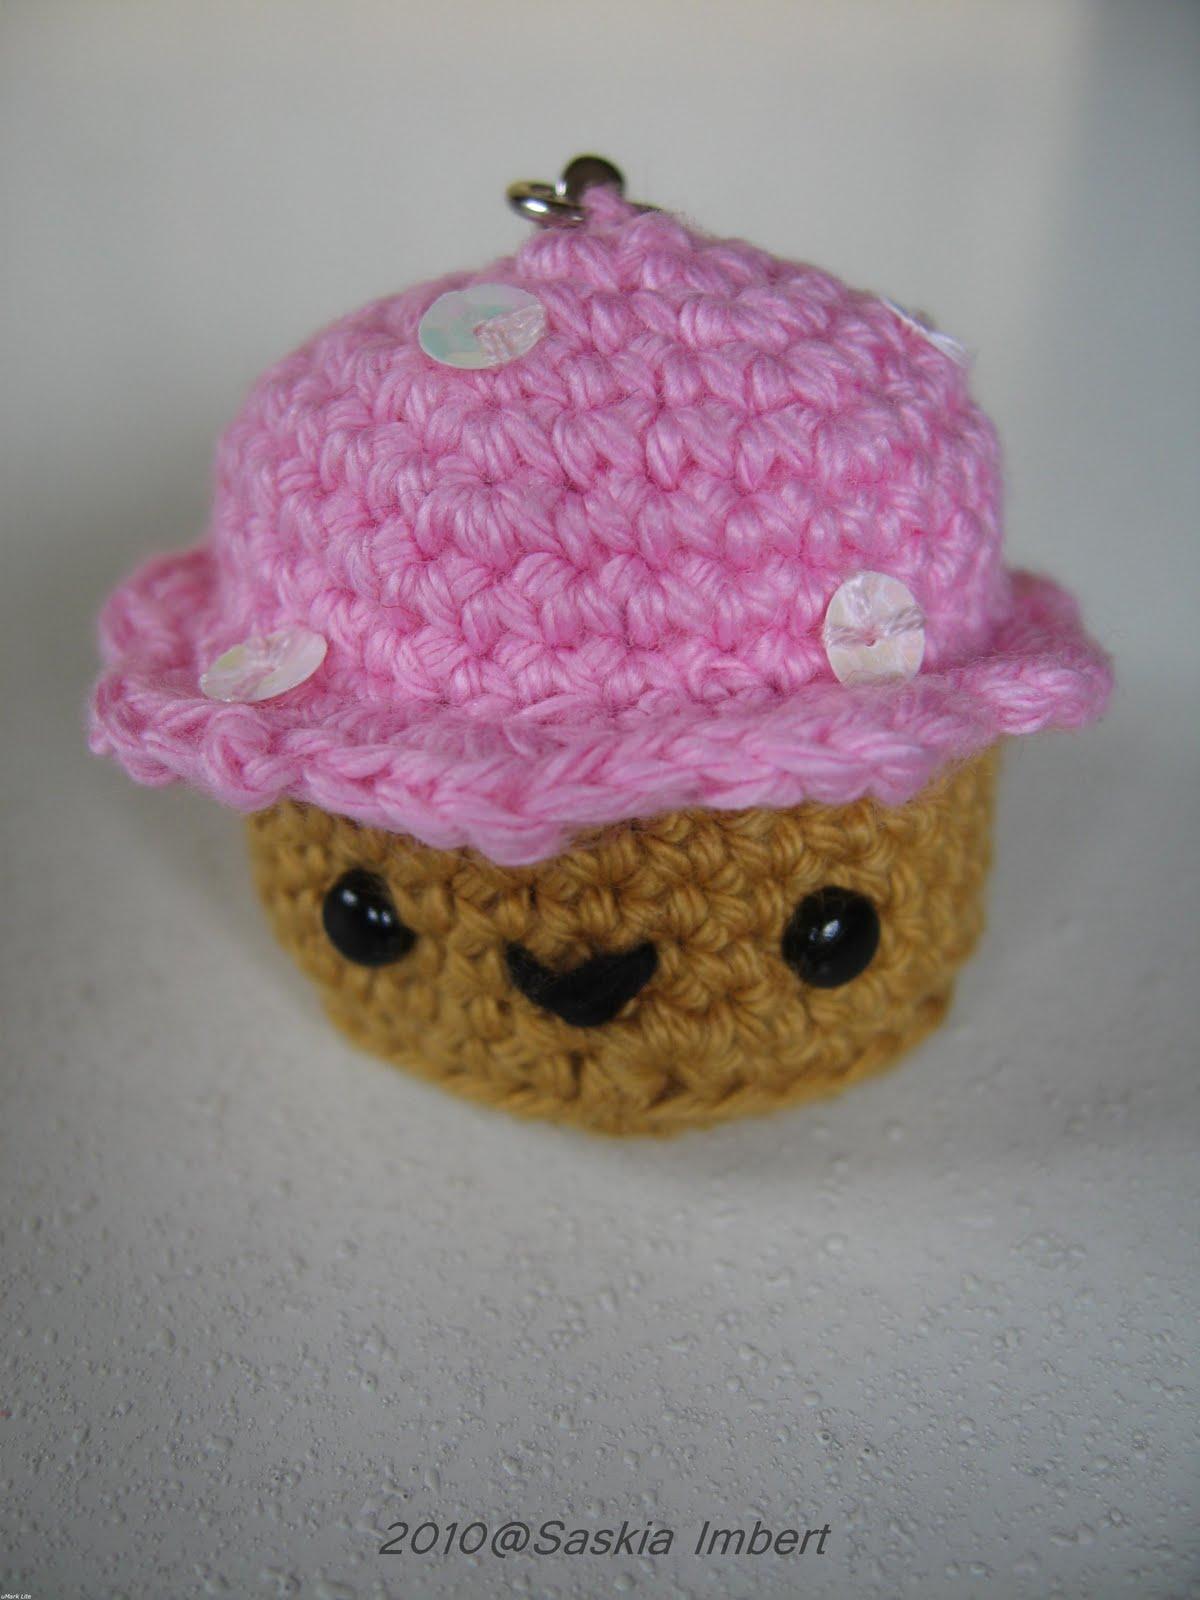 Amigurumi World Download : Amigurumi World: Seriously Cute Crochet: Ana Paula Rimoli